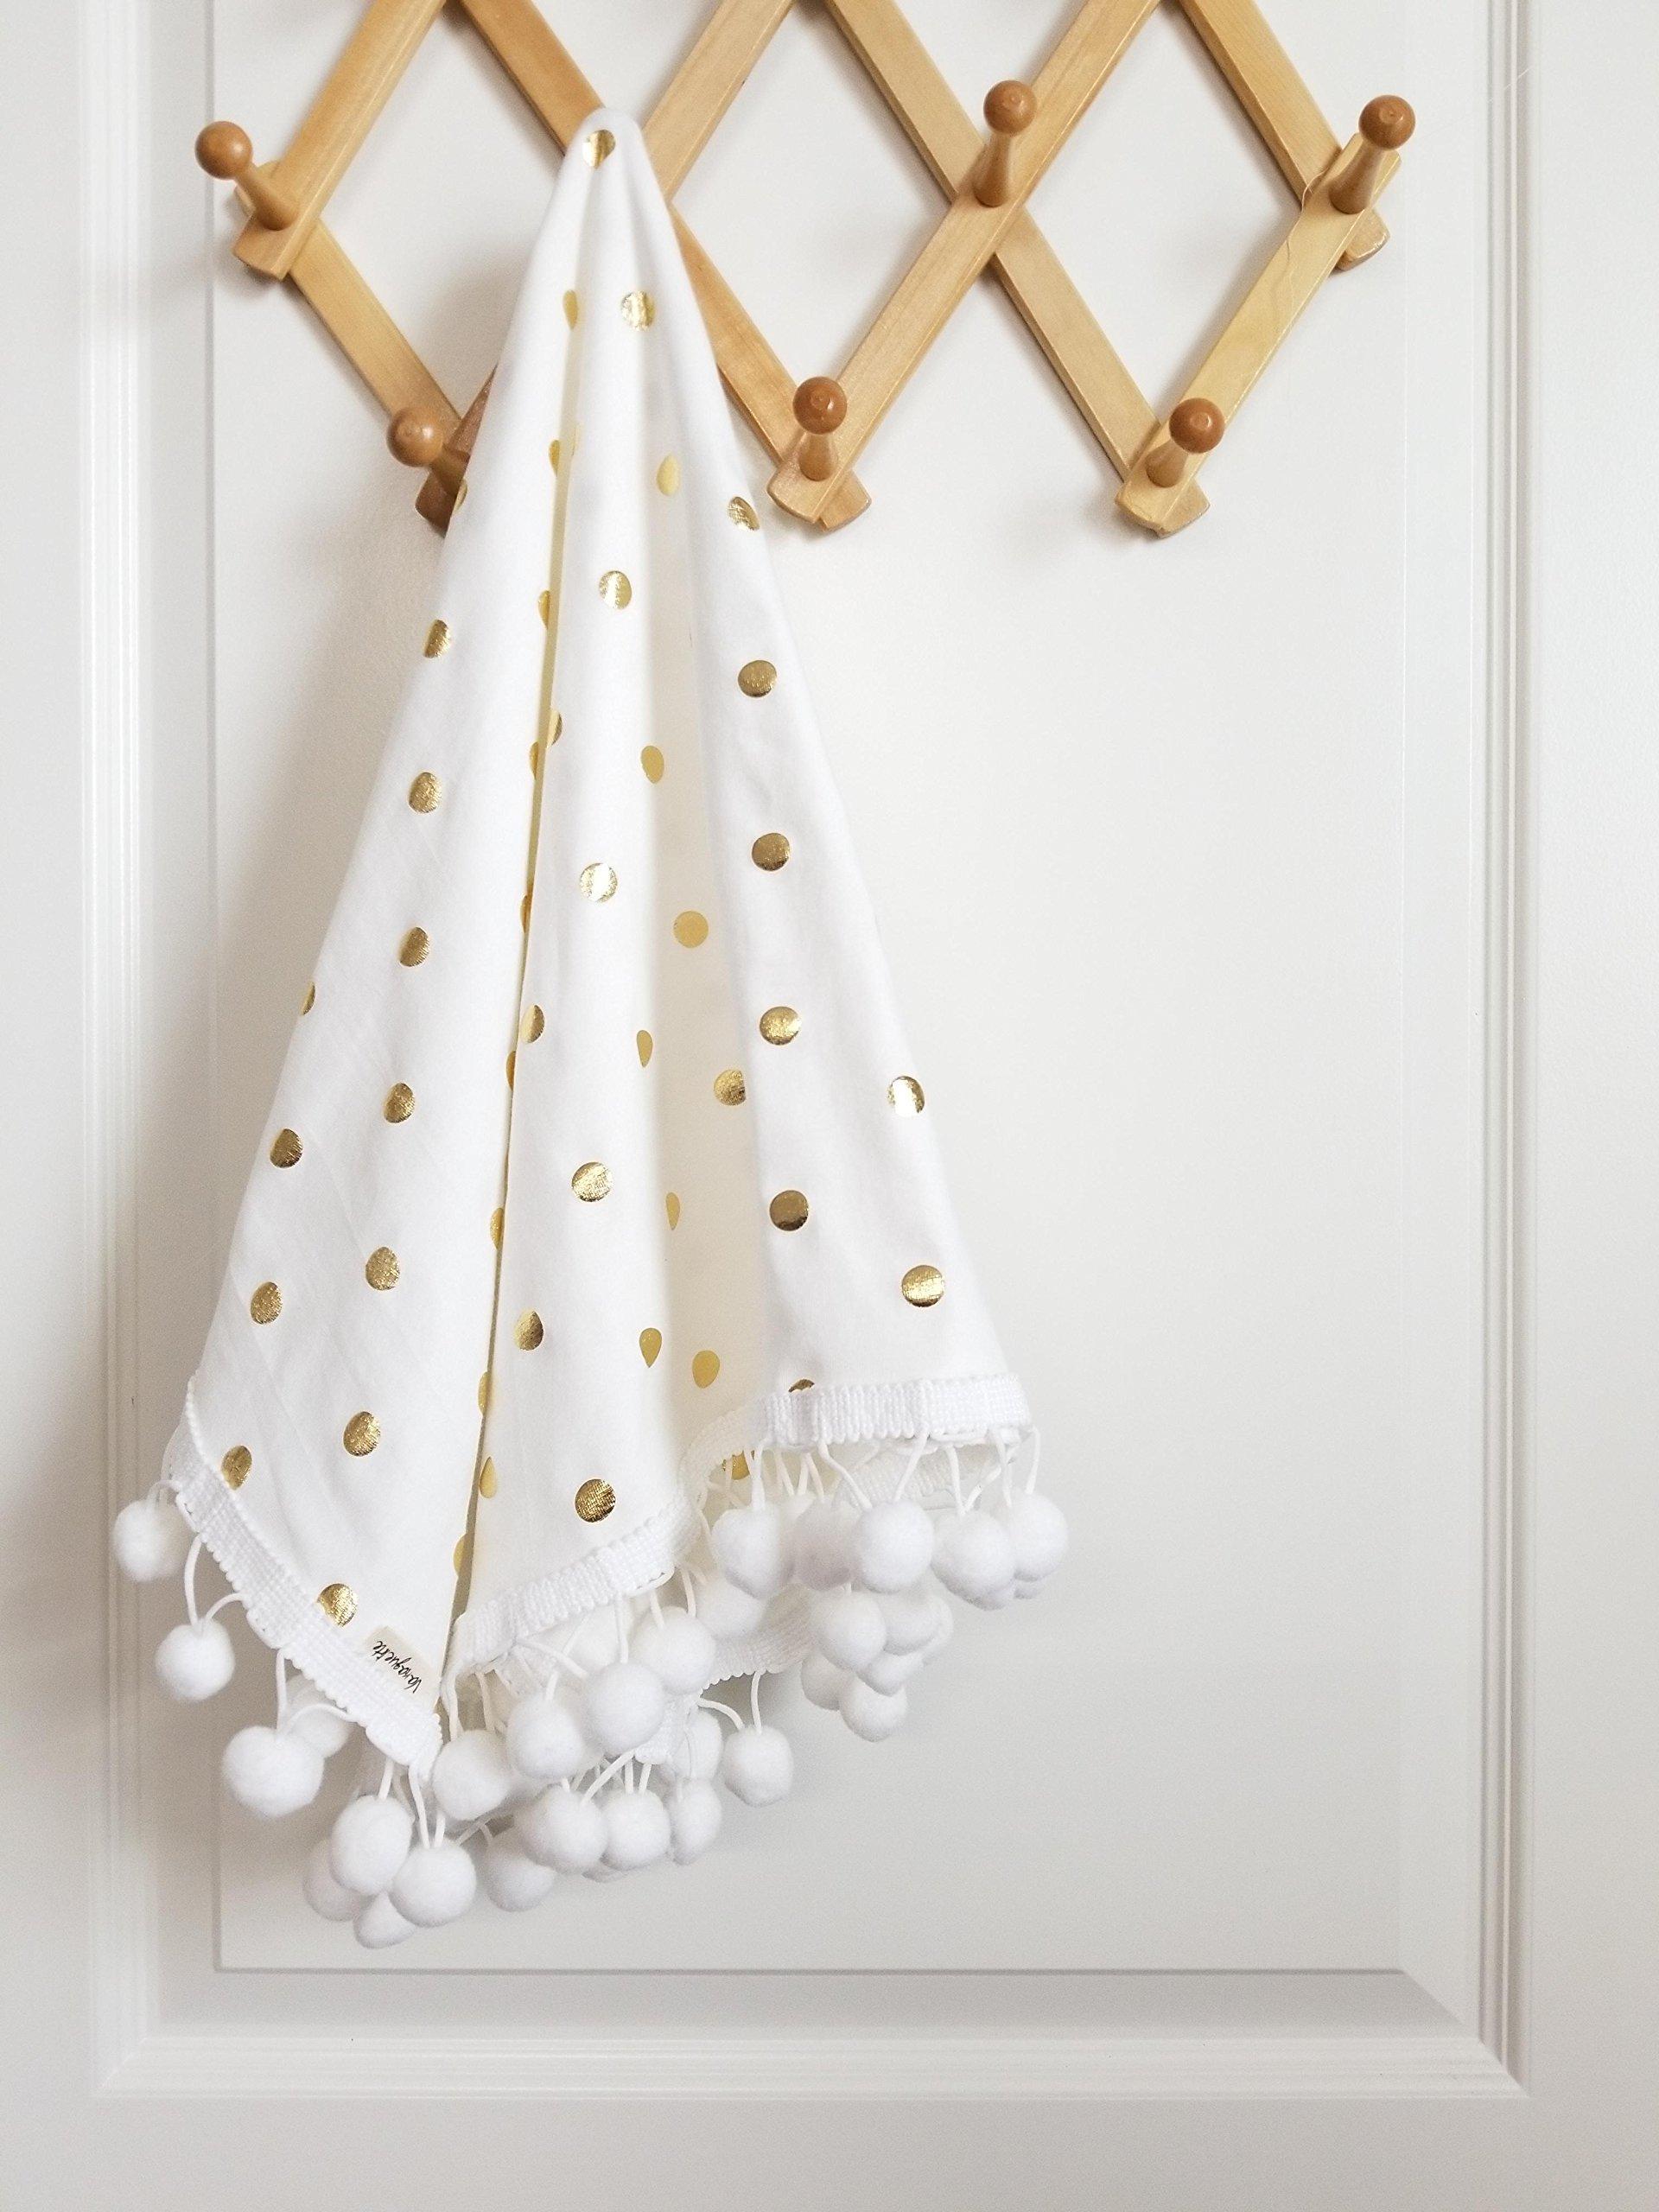 Baby Blankets - girl Pom pom Blanket - White and gold polka dot - Cotton Knit swaddle